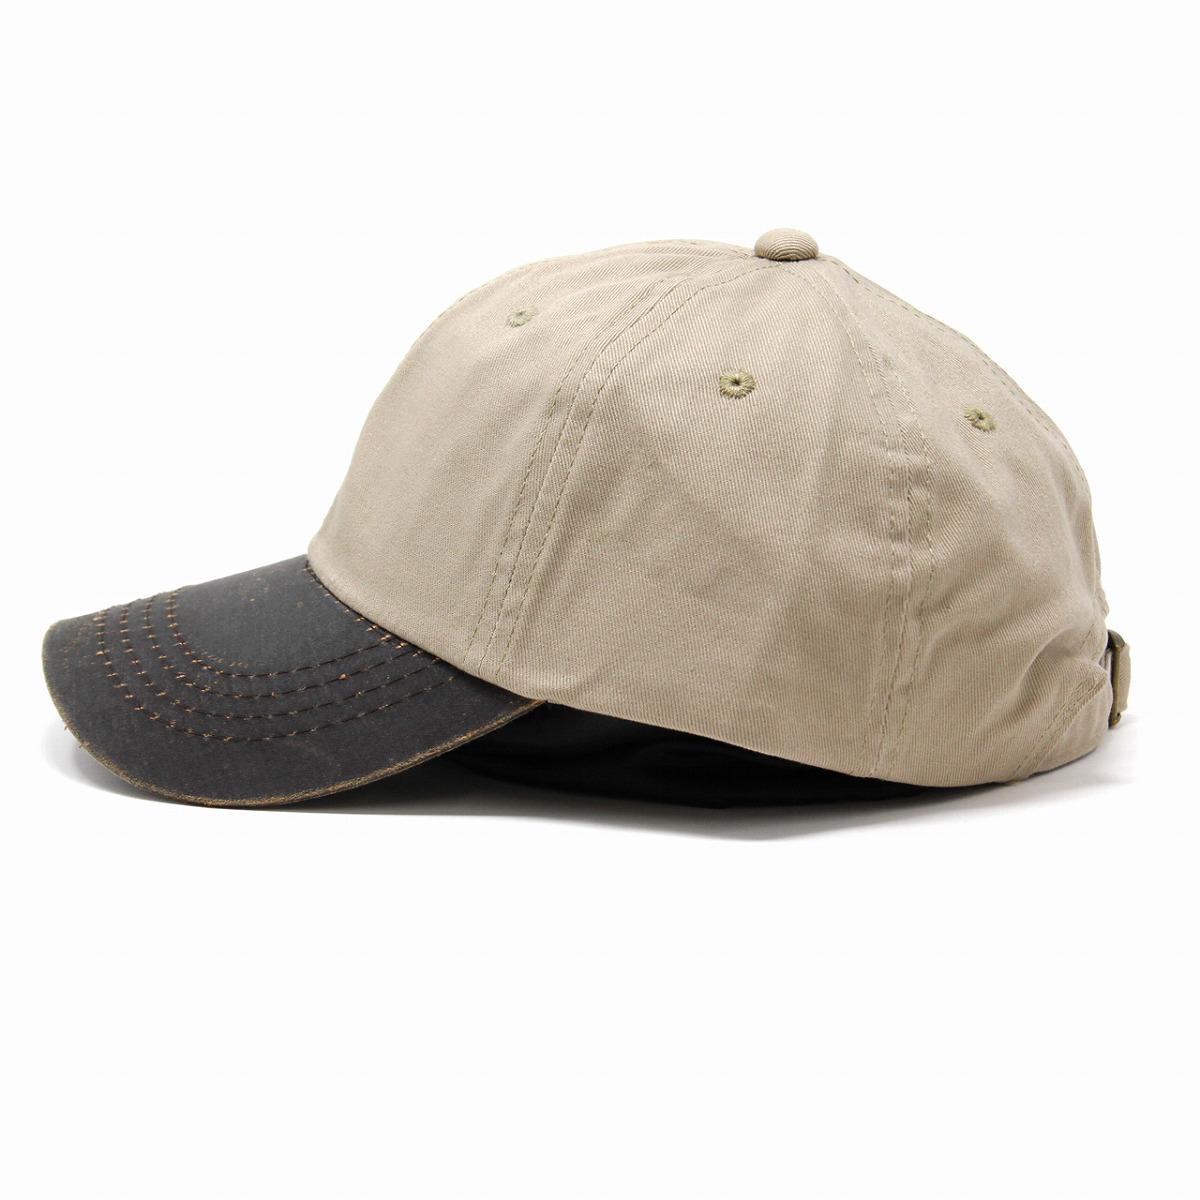 c7963f022 Casual coordinates accessory baseball cap Shin pull plain fabric adjustable  size size adjustable / beige [cap] male in a cap men cotton hat ...